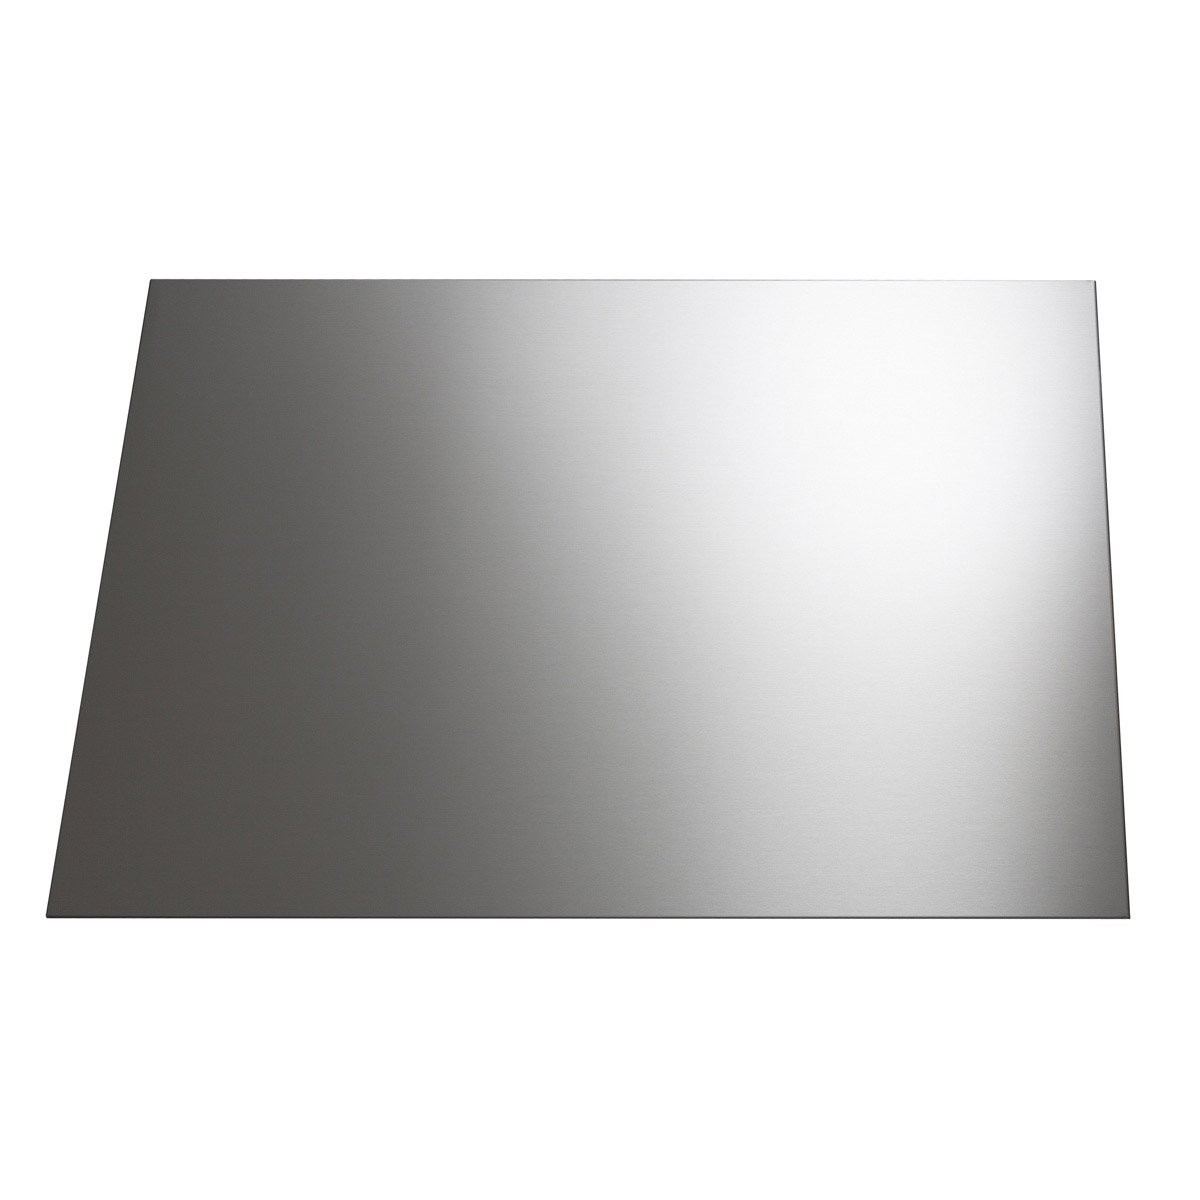 plaque polycarbonate 10mm leroy merlin altoservices. Black Bedroom Furniture Sets. Home Design Ideas